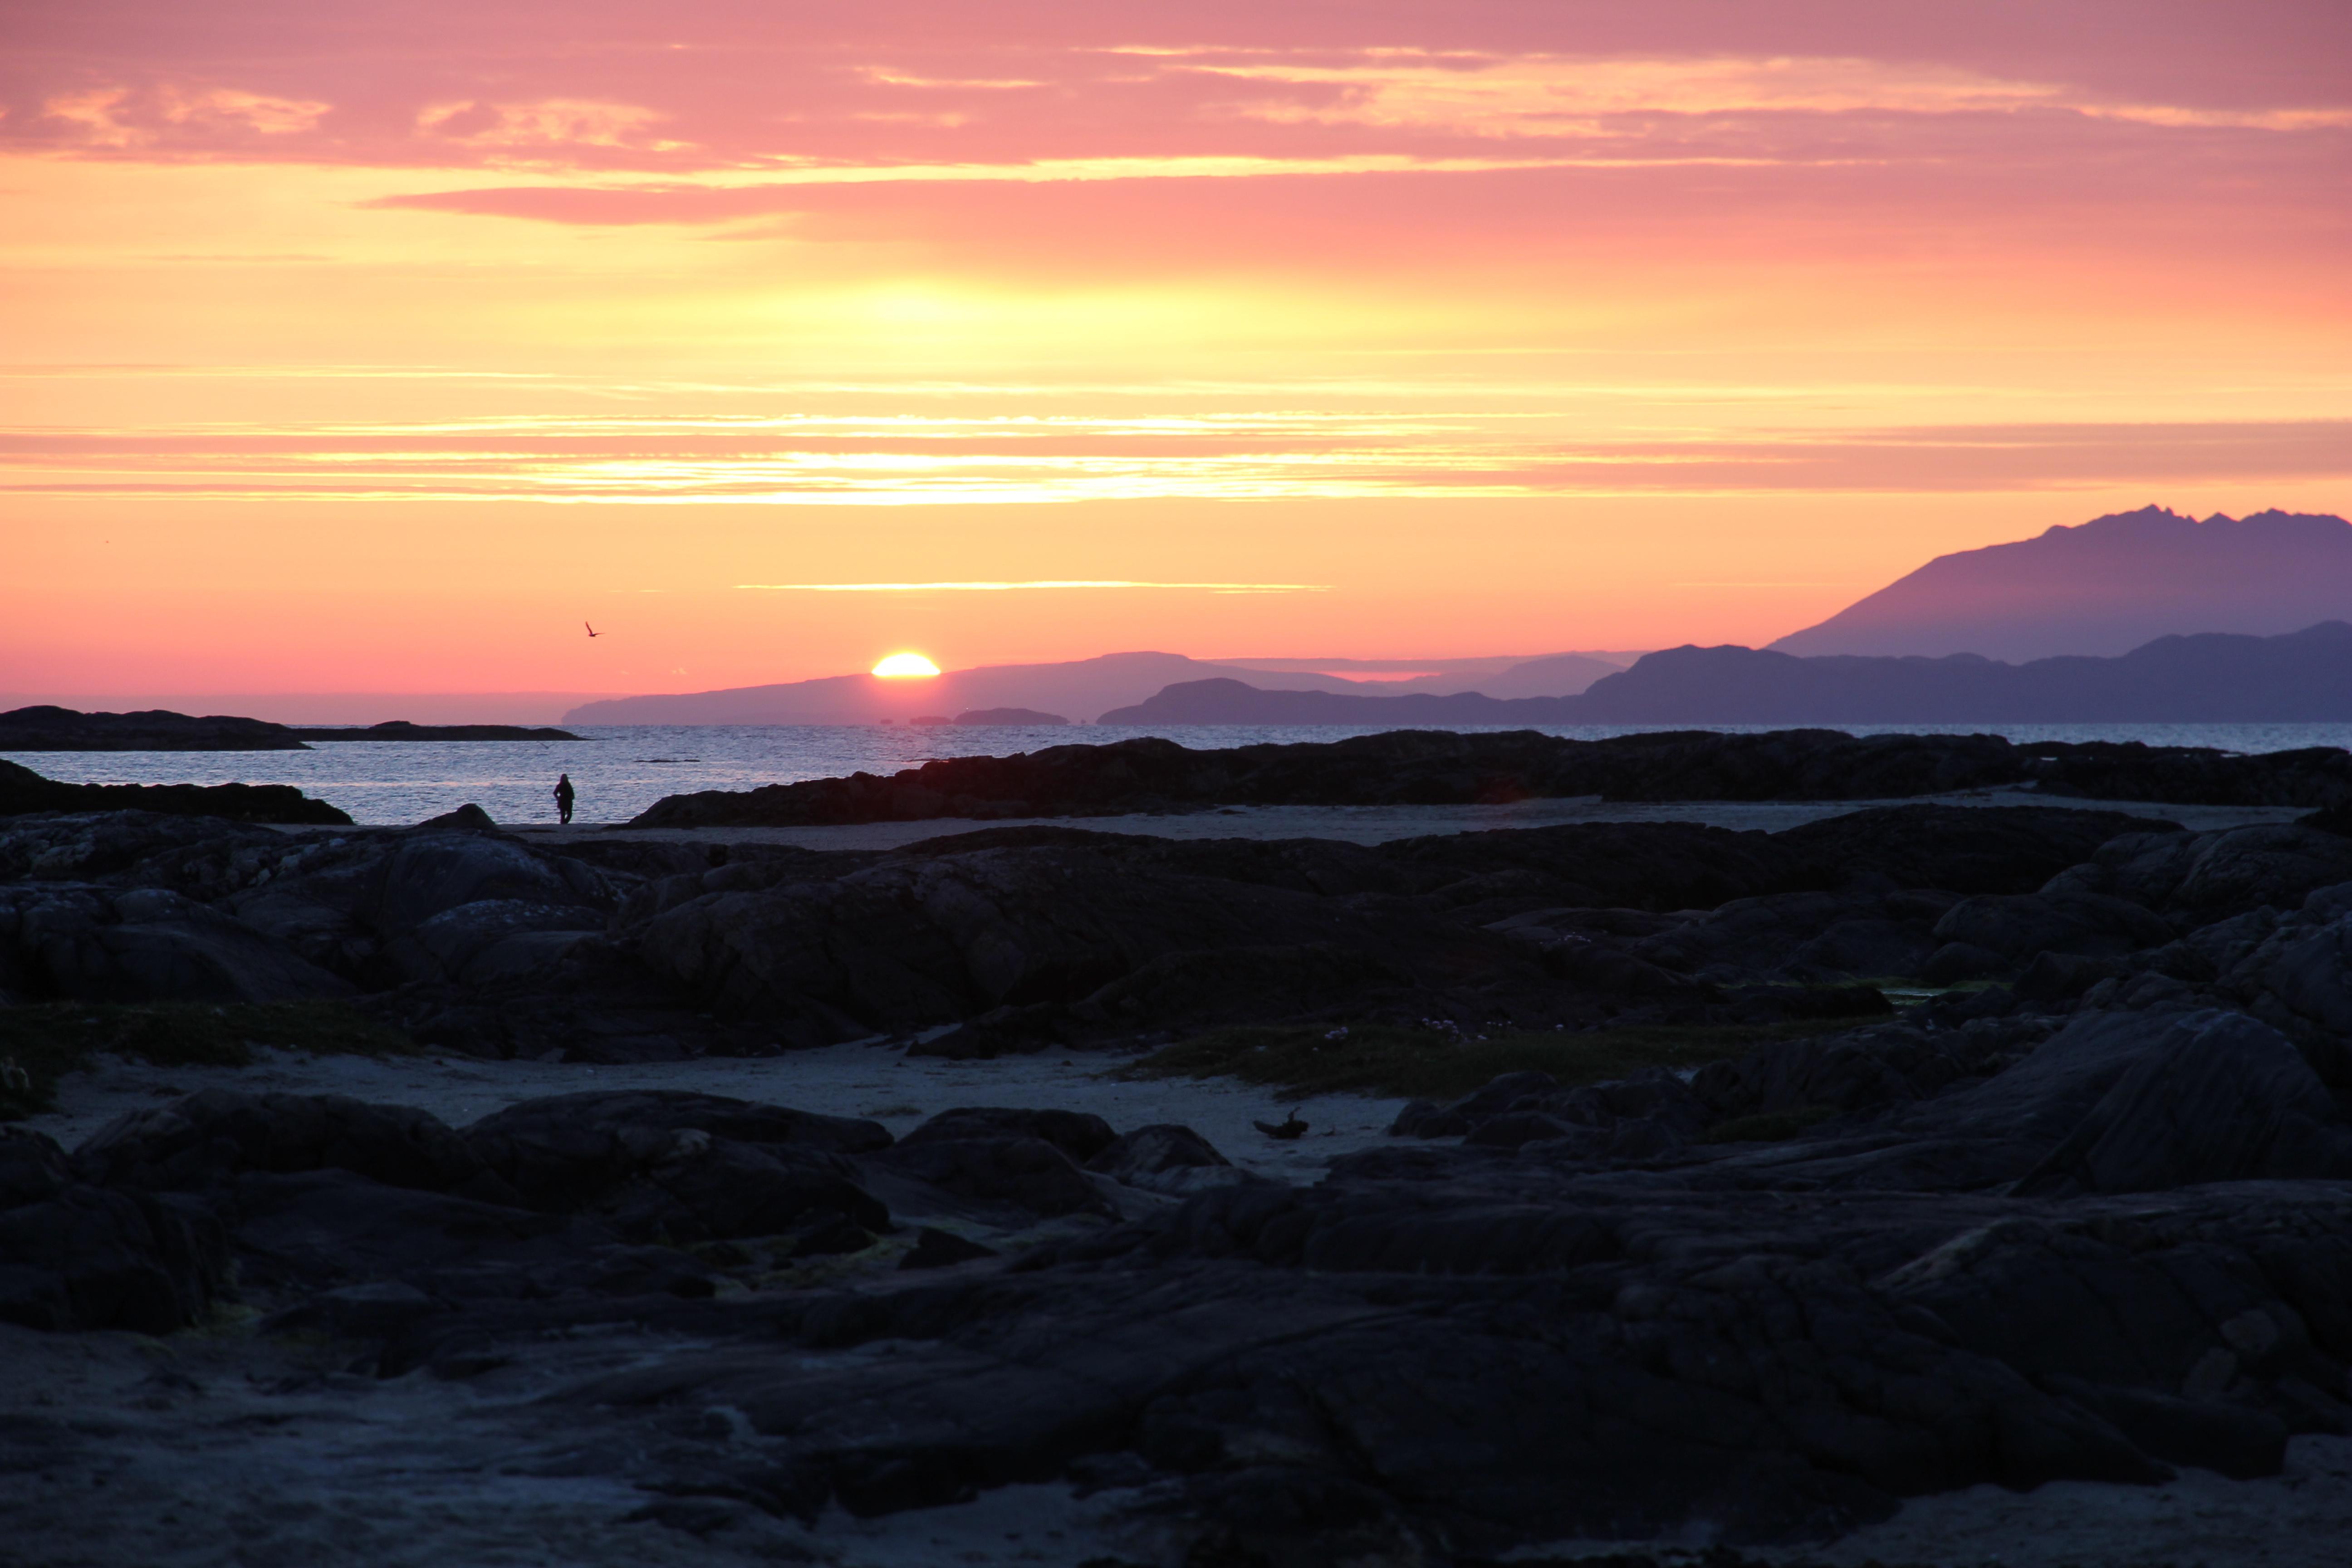 VW T5 T6 California Schottland Roadtrip 2015 Wildcamping Sonnenuntergang Abendstimmung Isle of Skye